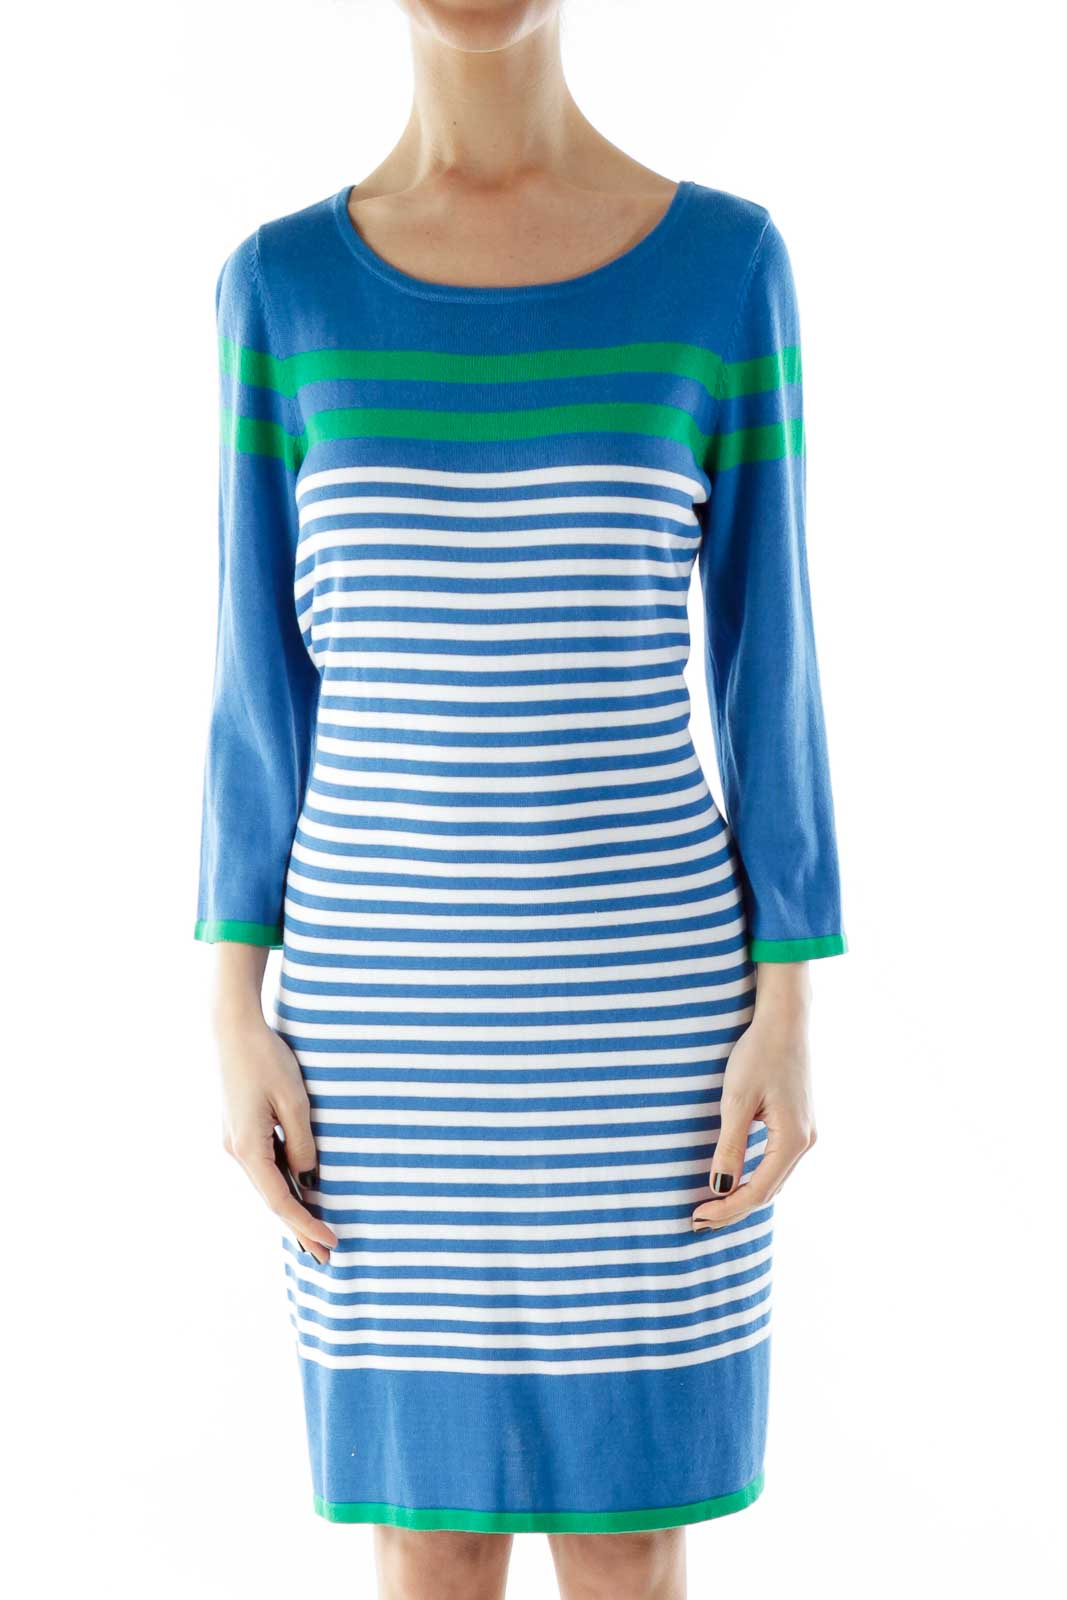 Blue Green Striped Knit Dress Front